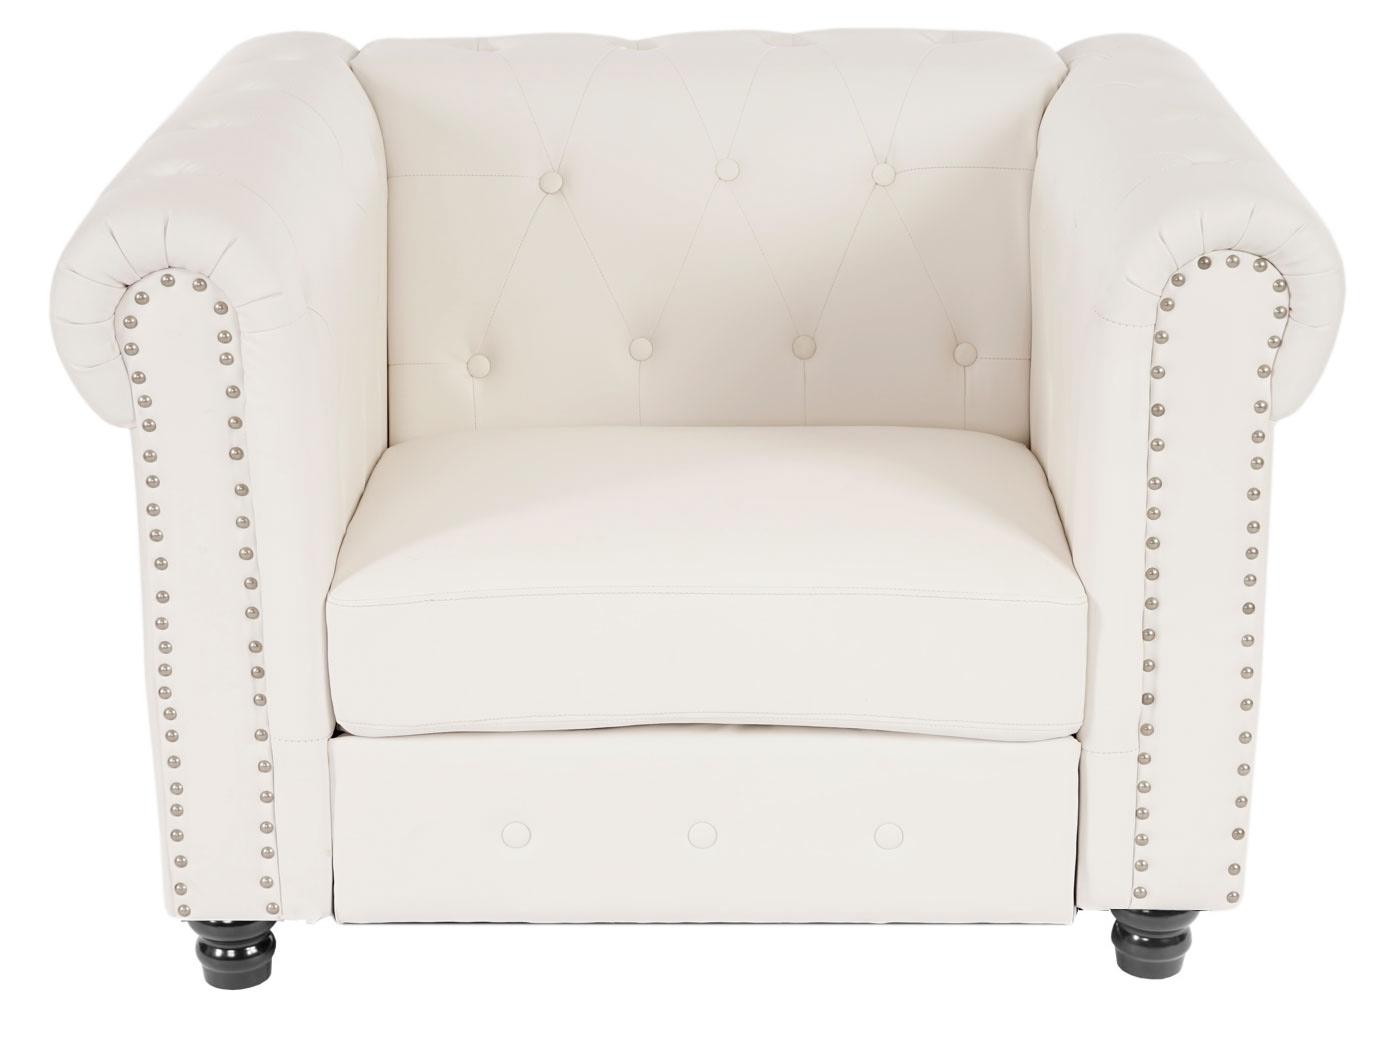 luxus sessel loungesessel relaxsessel chesterfield kunstleder runde f e wei. Black Bedroom Furniture Sets. Home Design Ideas